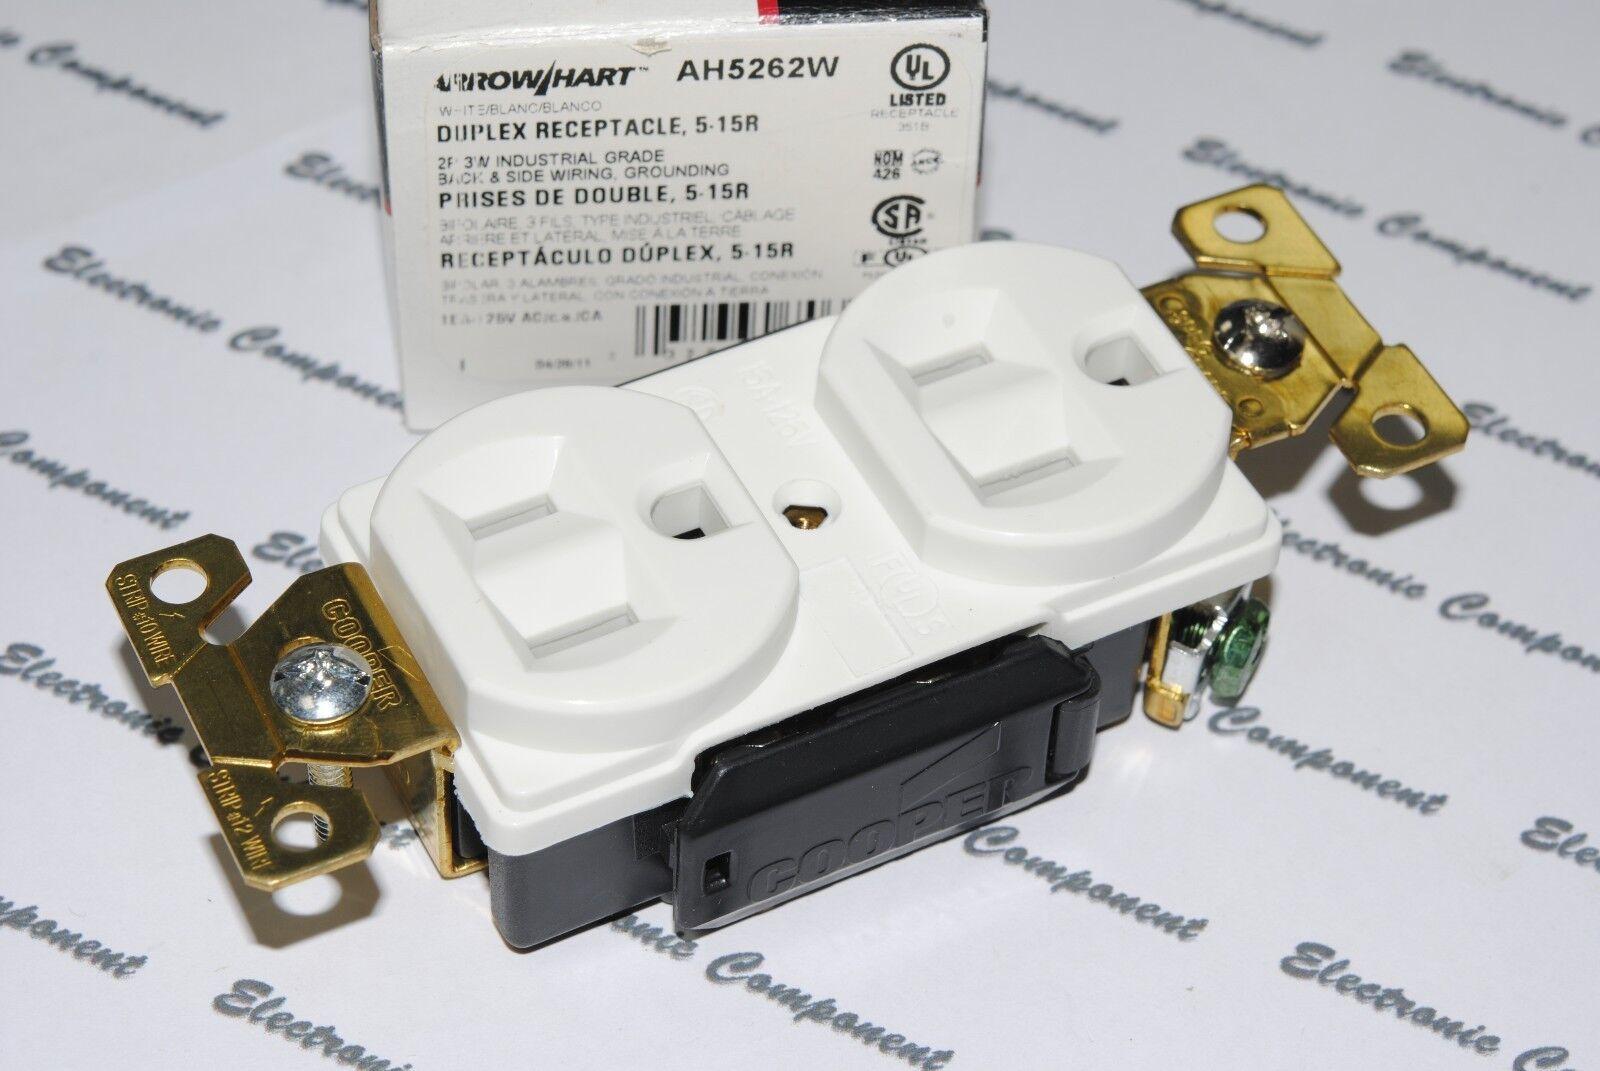 1pcs-cooper Wiring Ah5262w Premium Industrial Grade Duplex ...